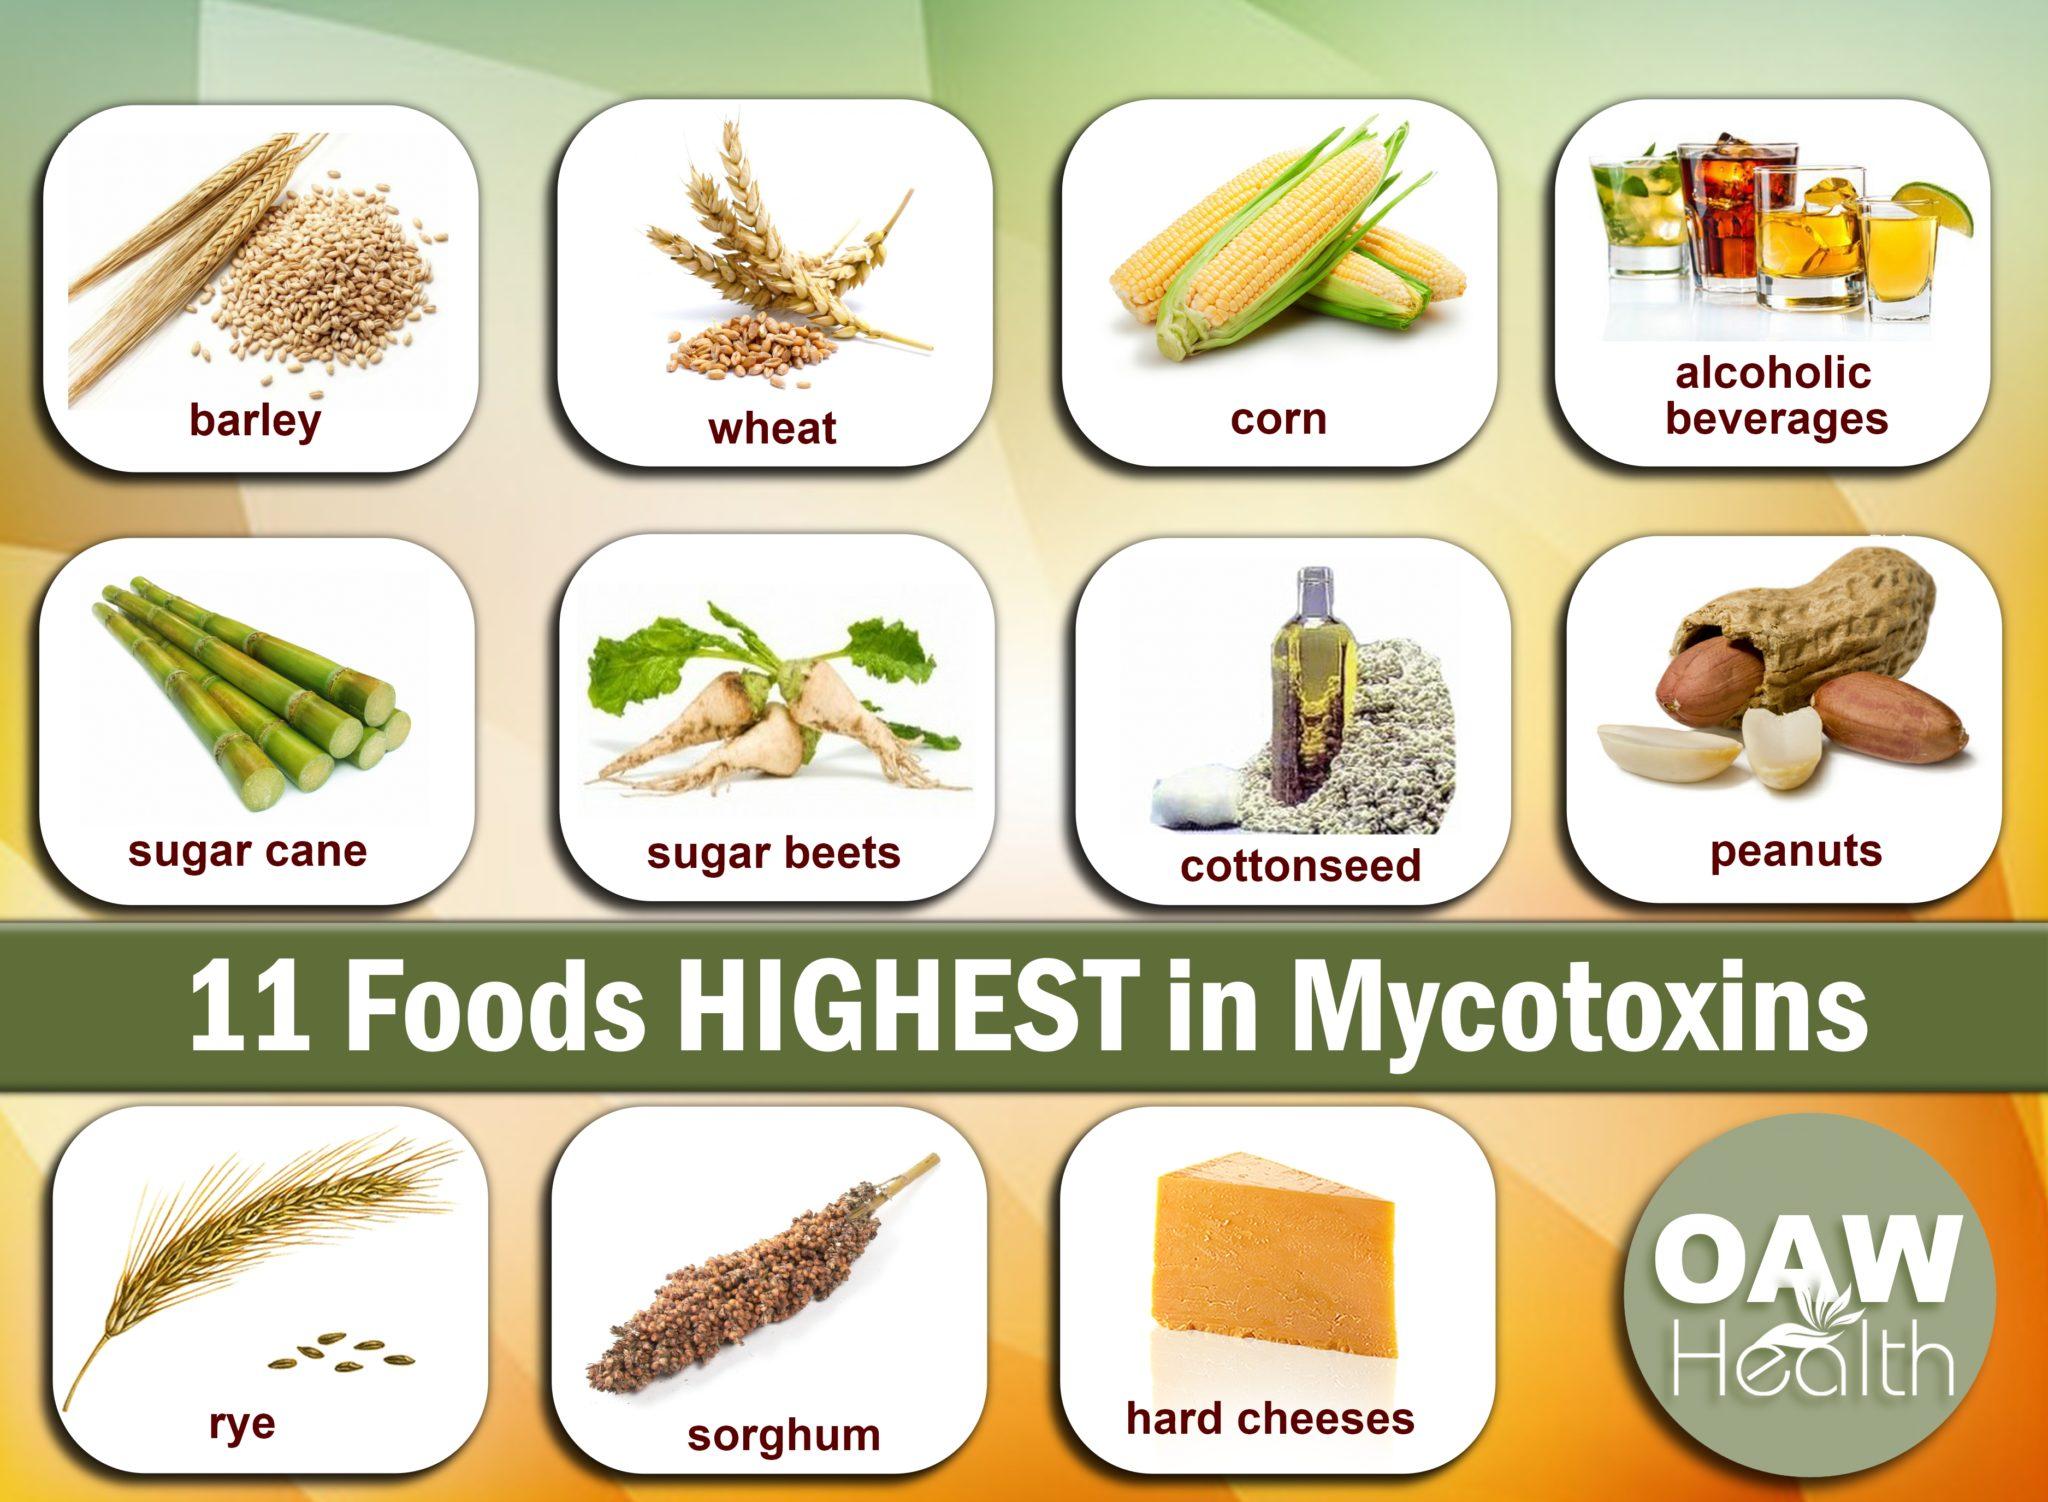 11-foods-highest-in-mycotoxins-www.oawhealth.com